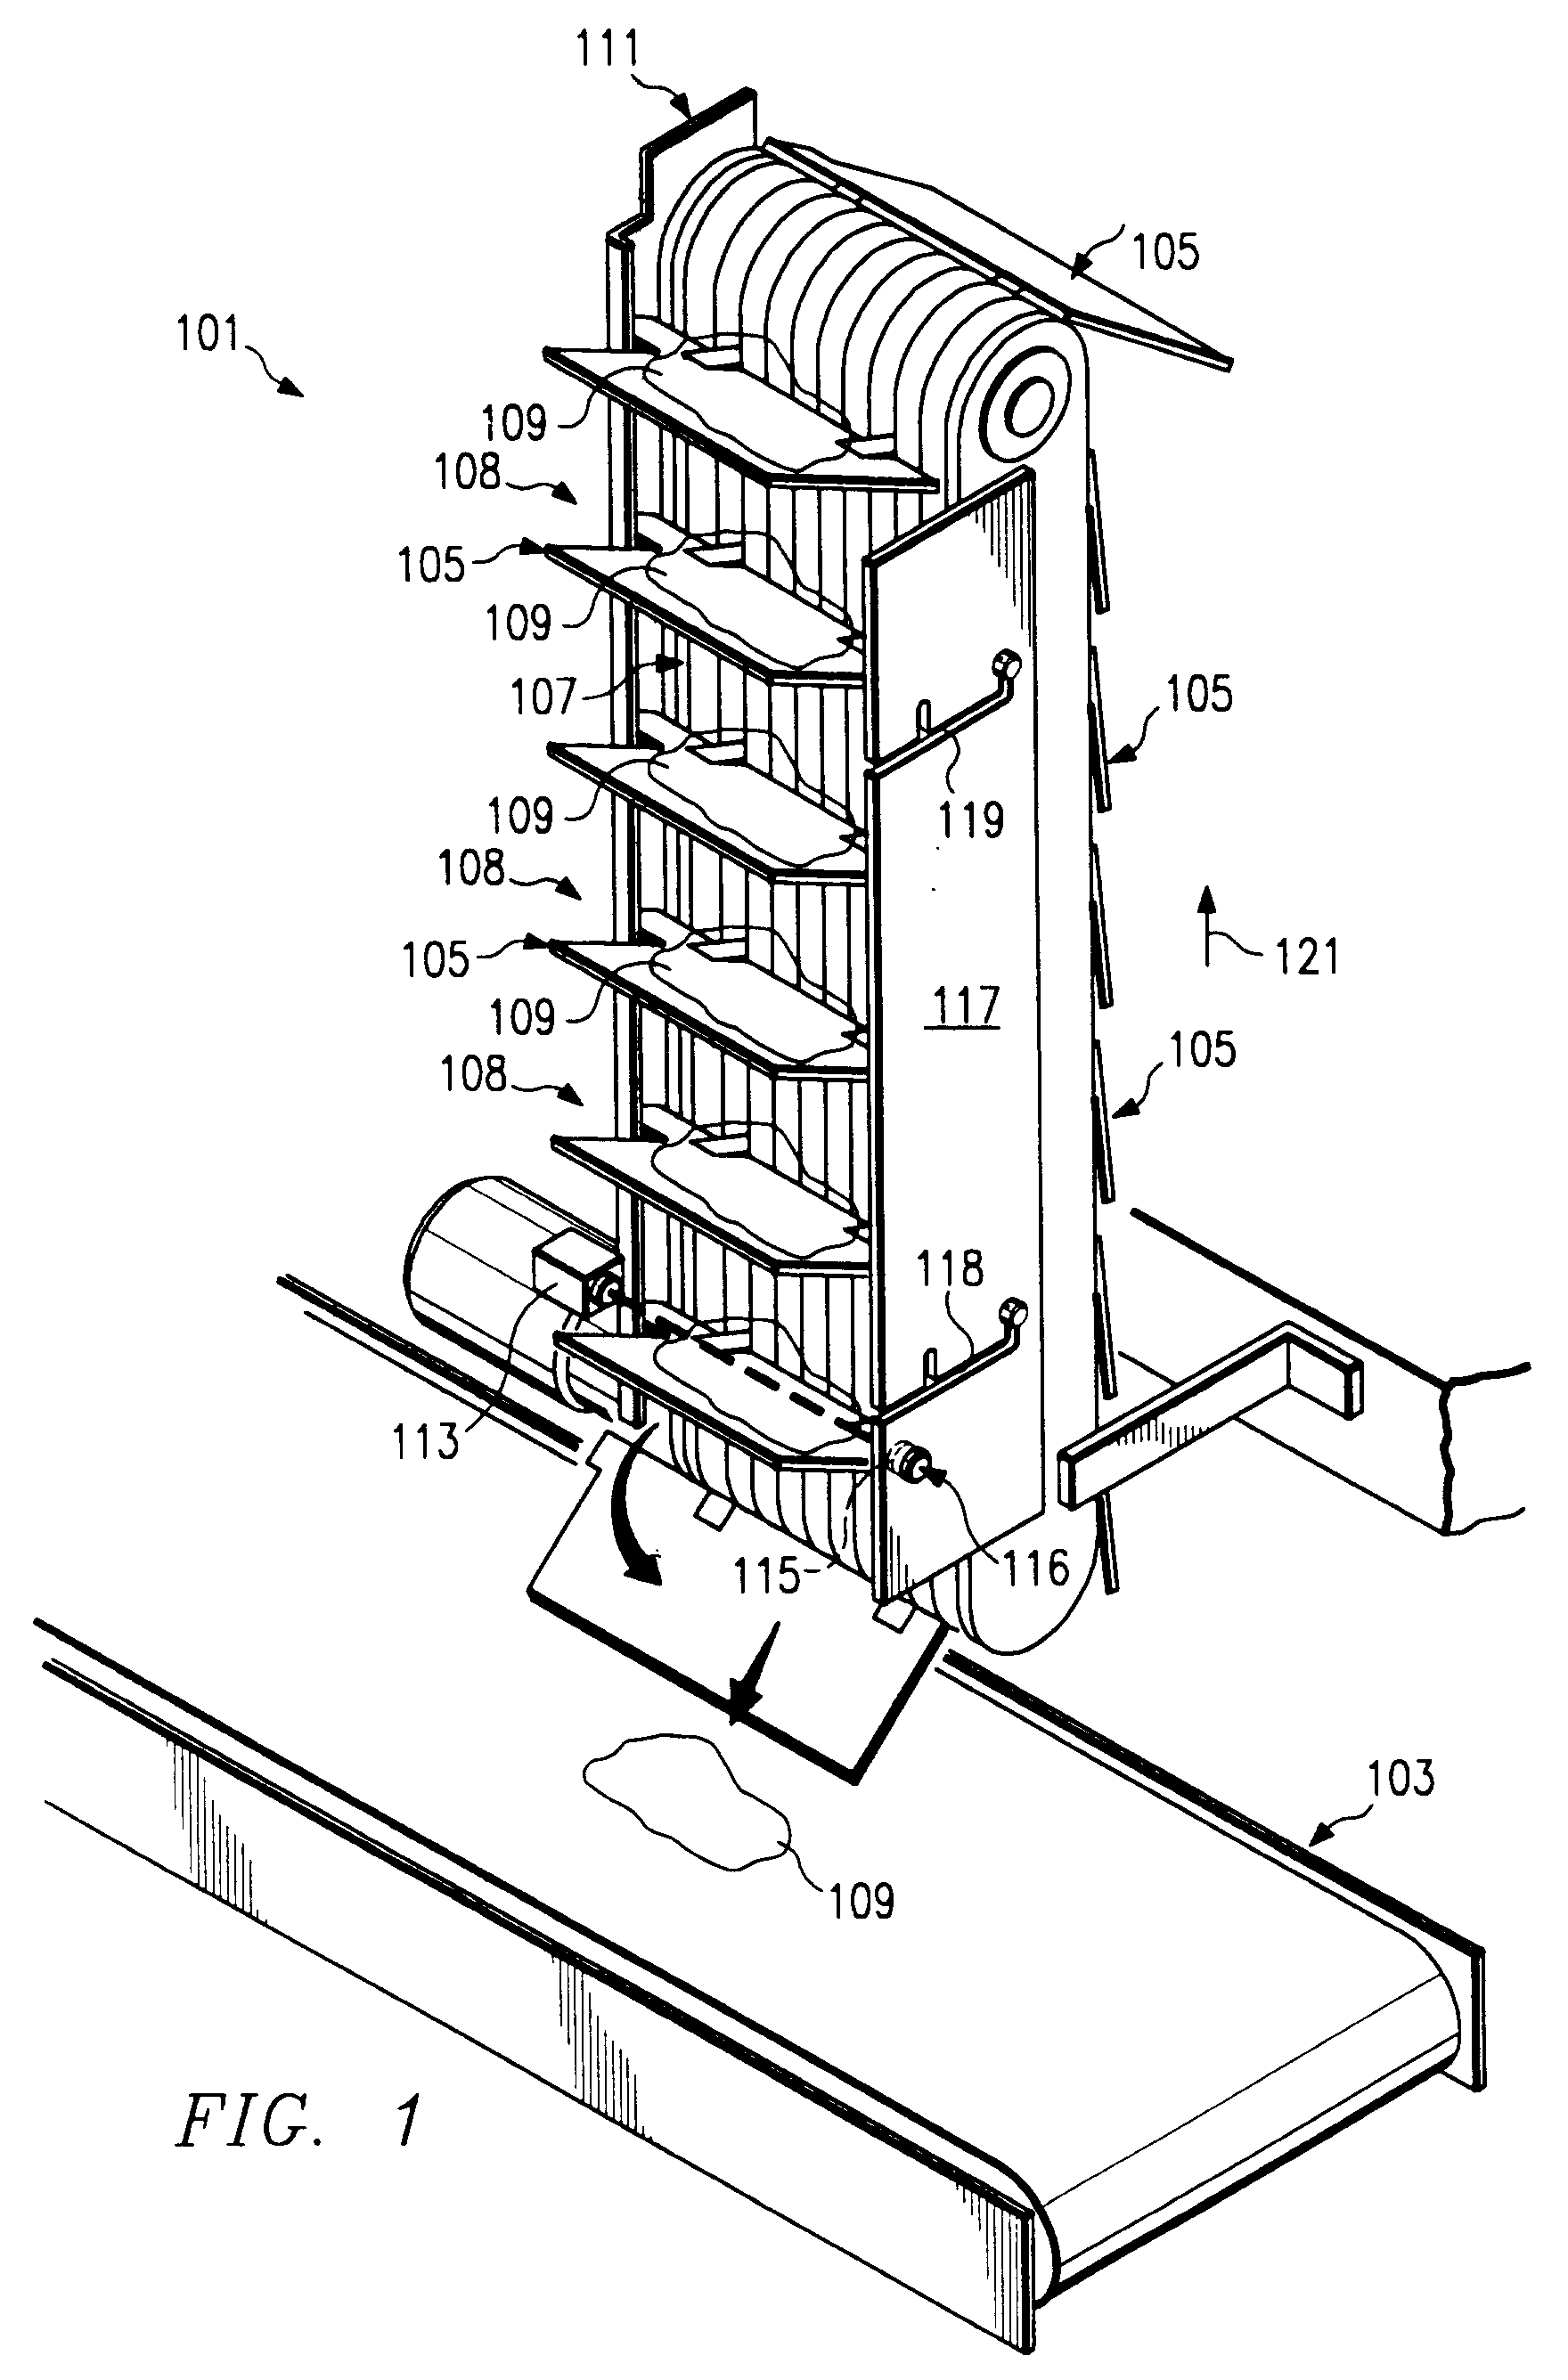 3 way switch ladder diagram 1966 ct90 wiring conveyor dryer belt circuit